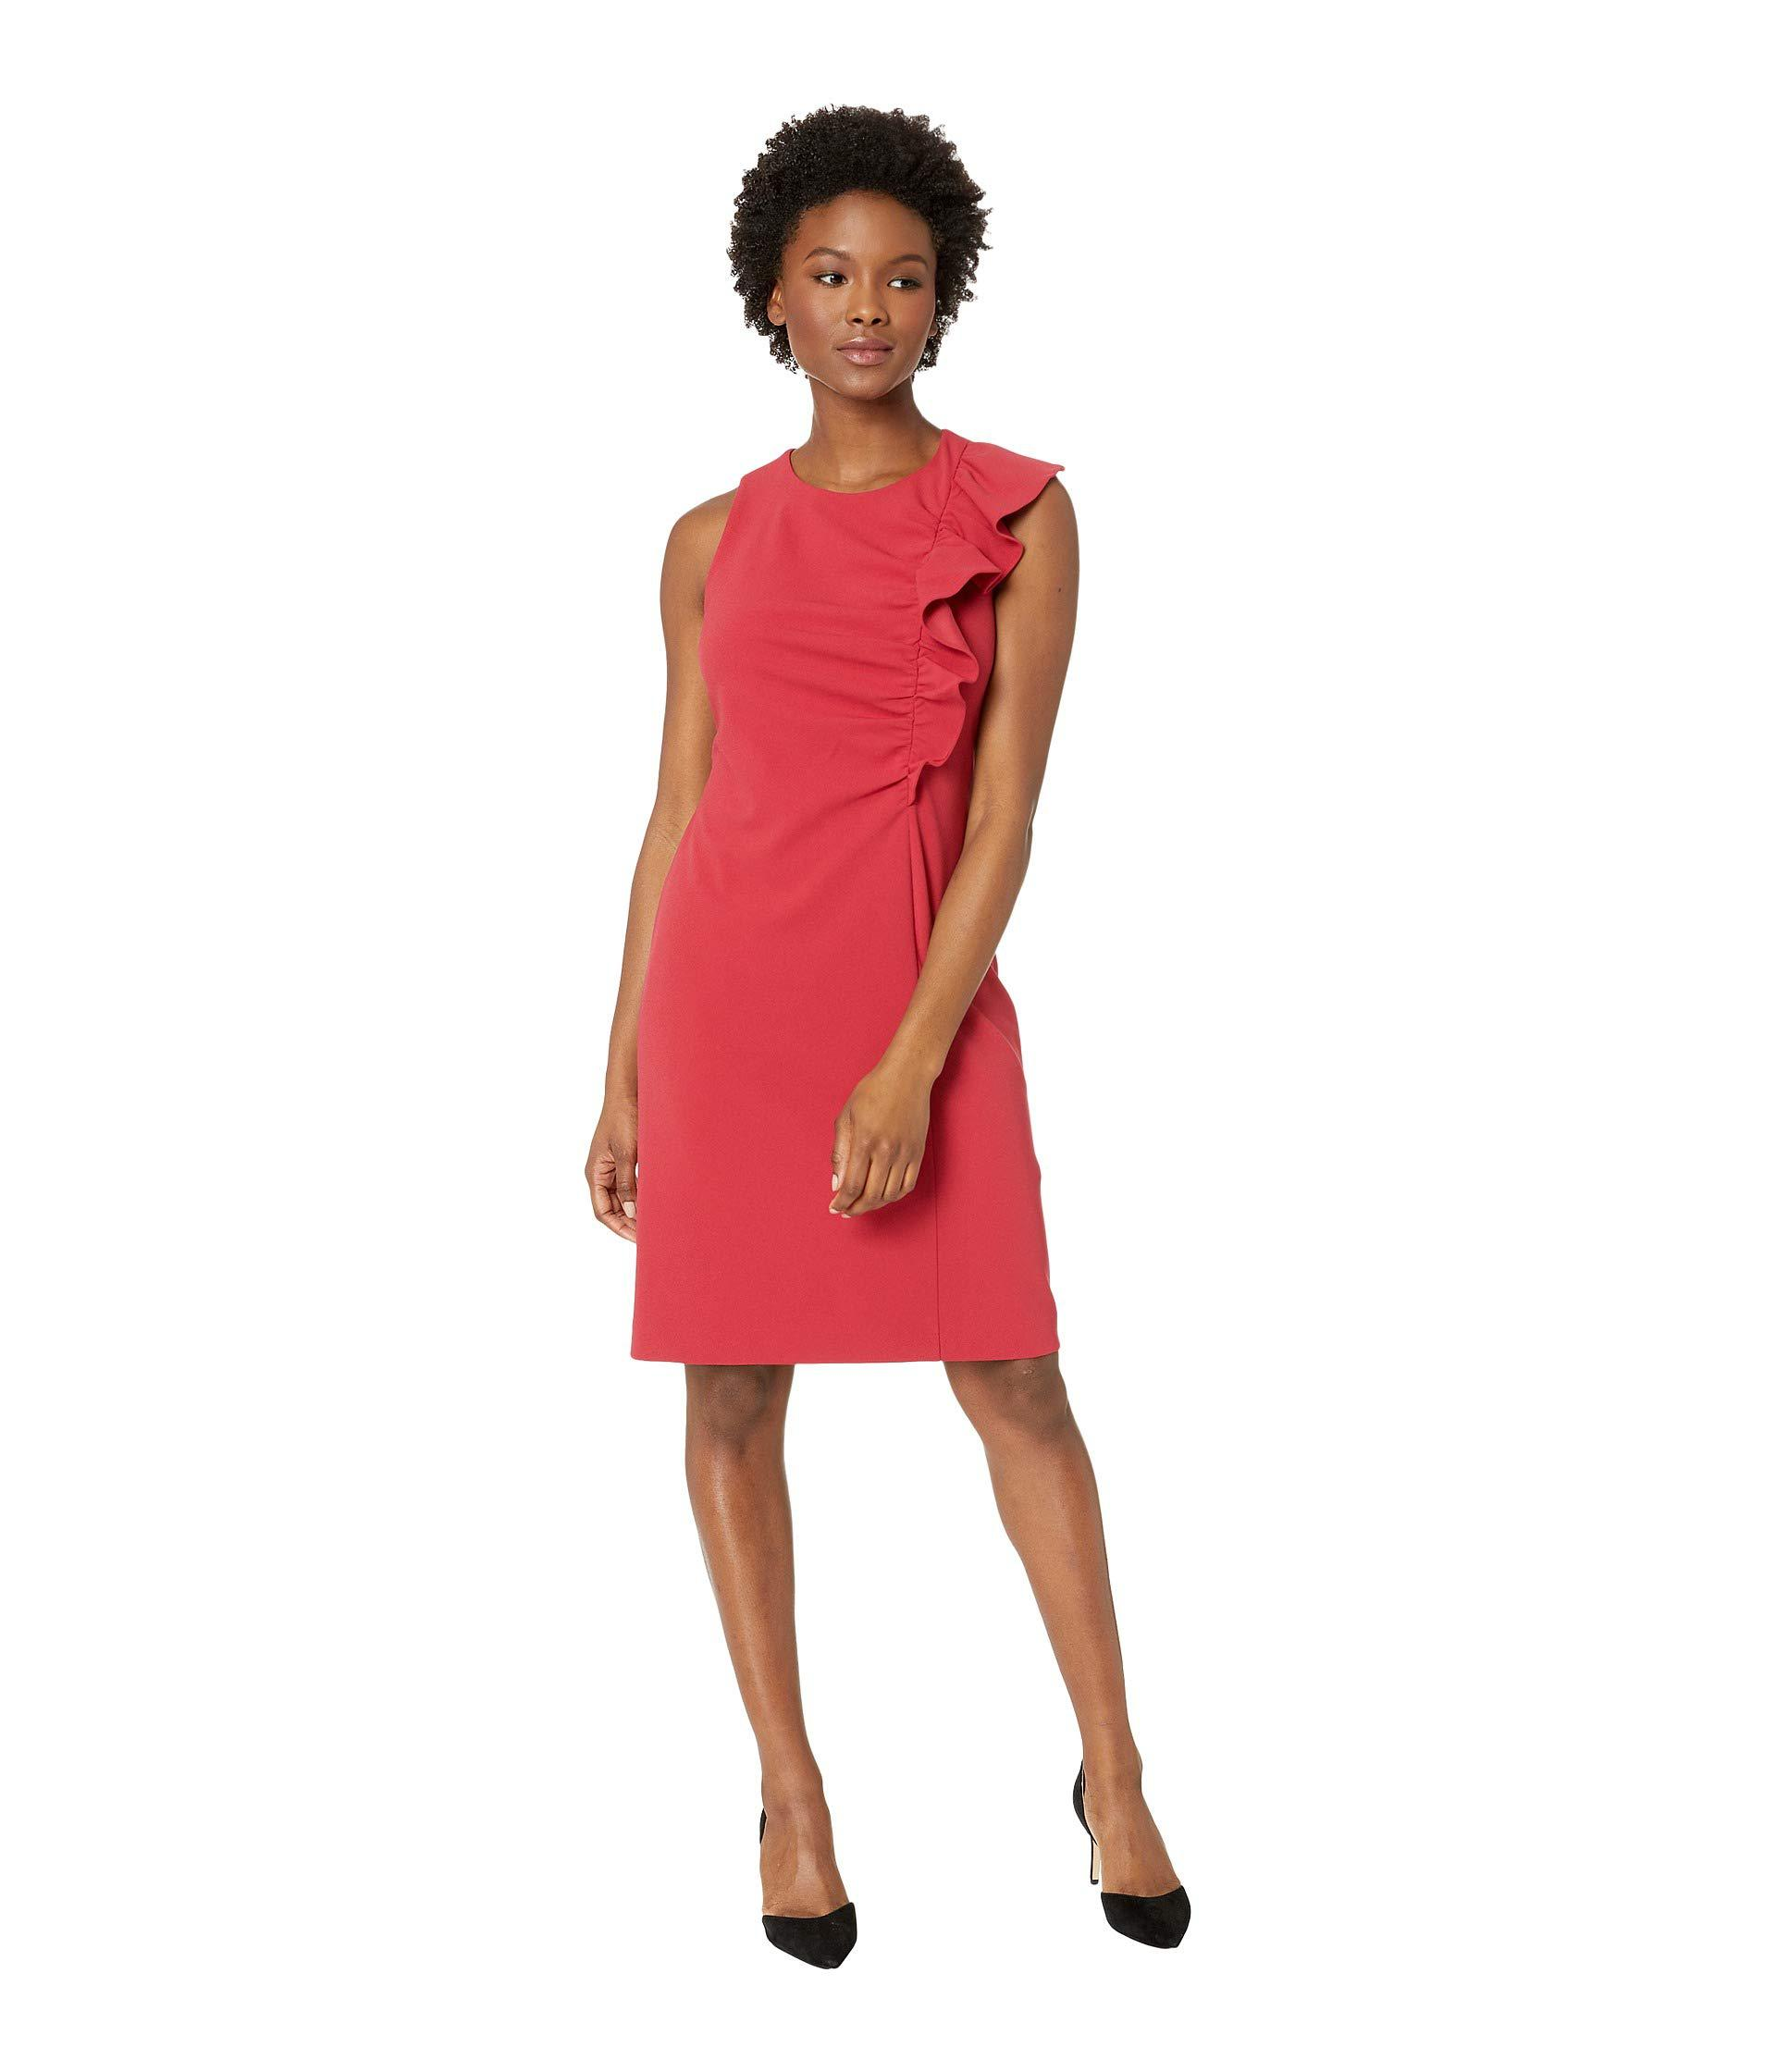 edcf58ad388 Lyst - Vince Camuto Sleeveless Asymmetrical Ruffle Ponte Dress ...